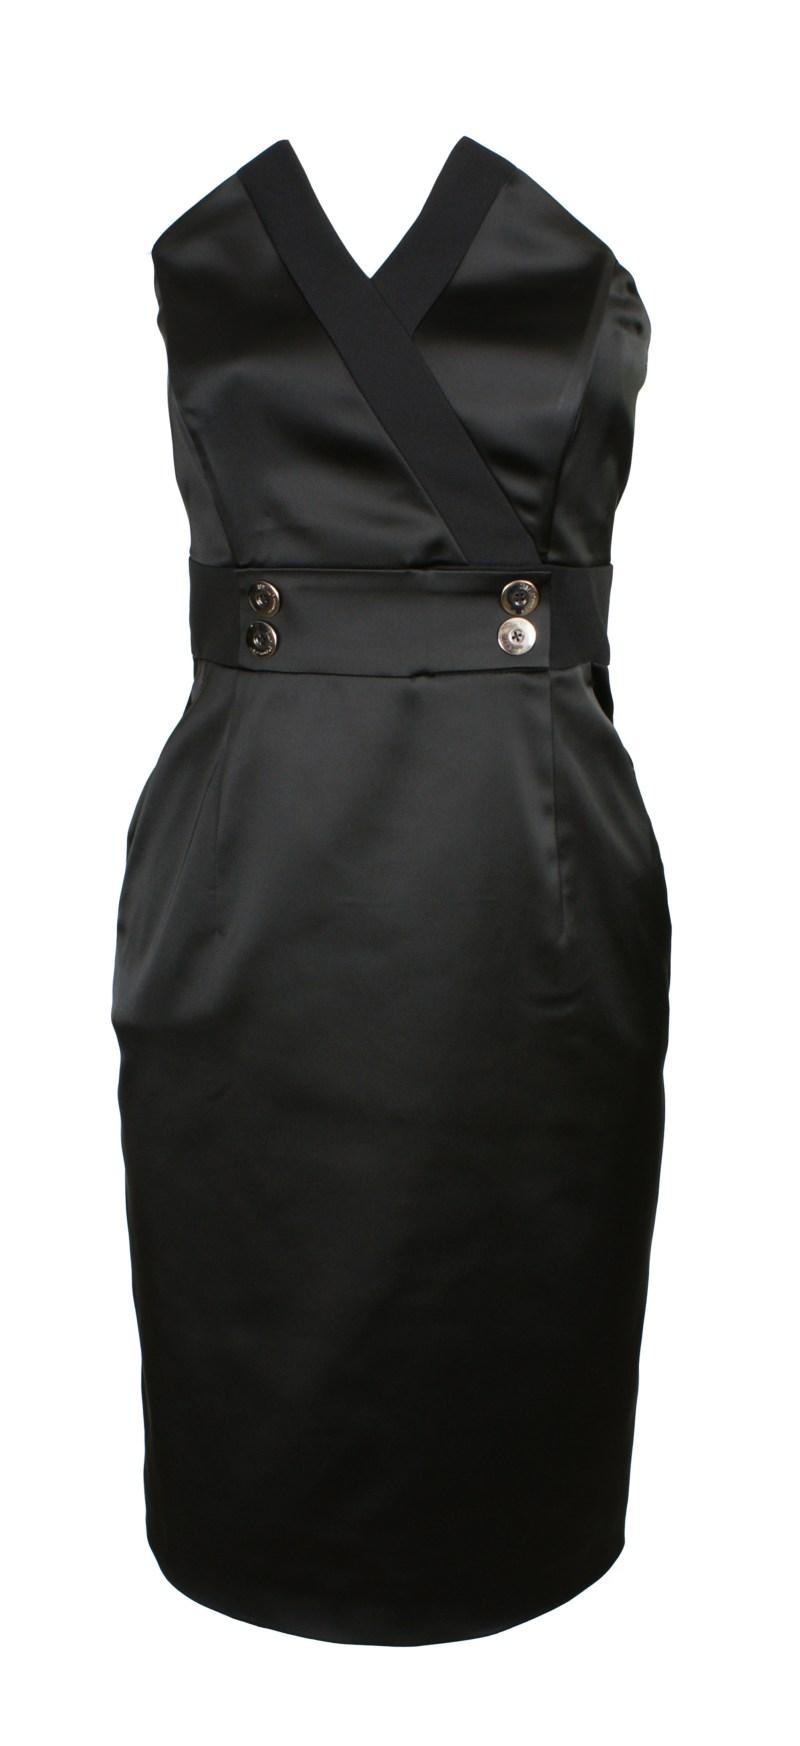 czarna sukienka odcinana pod biustem Simple - jesień/zima 2010/2011